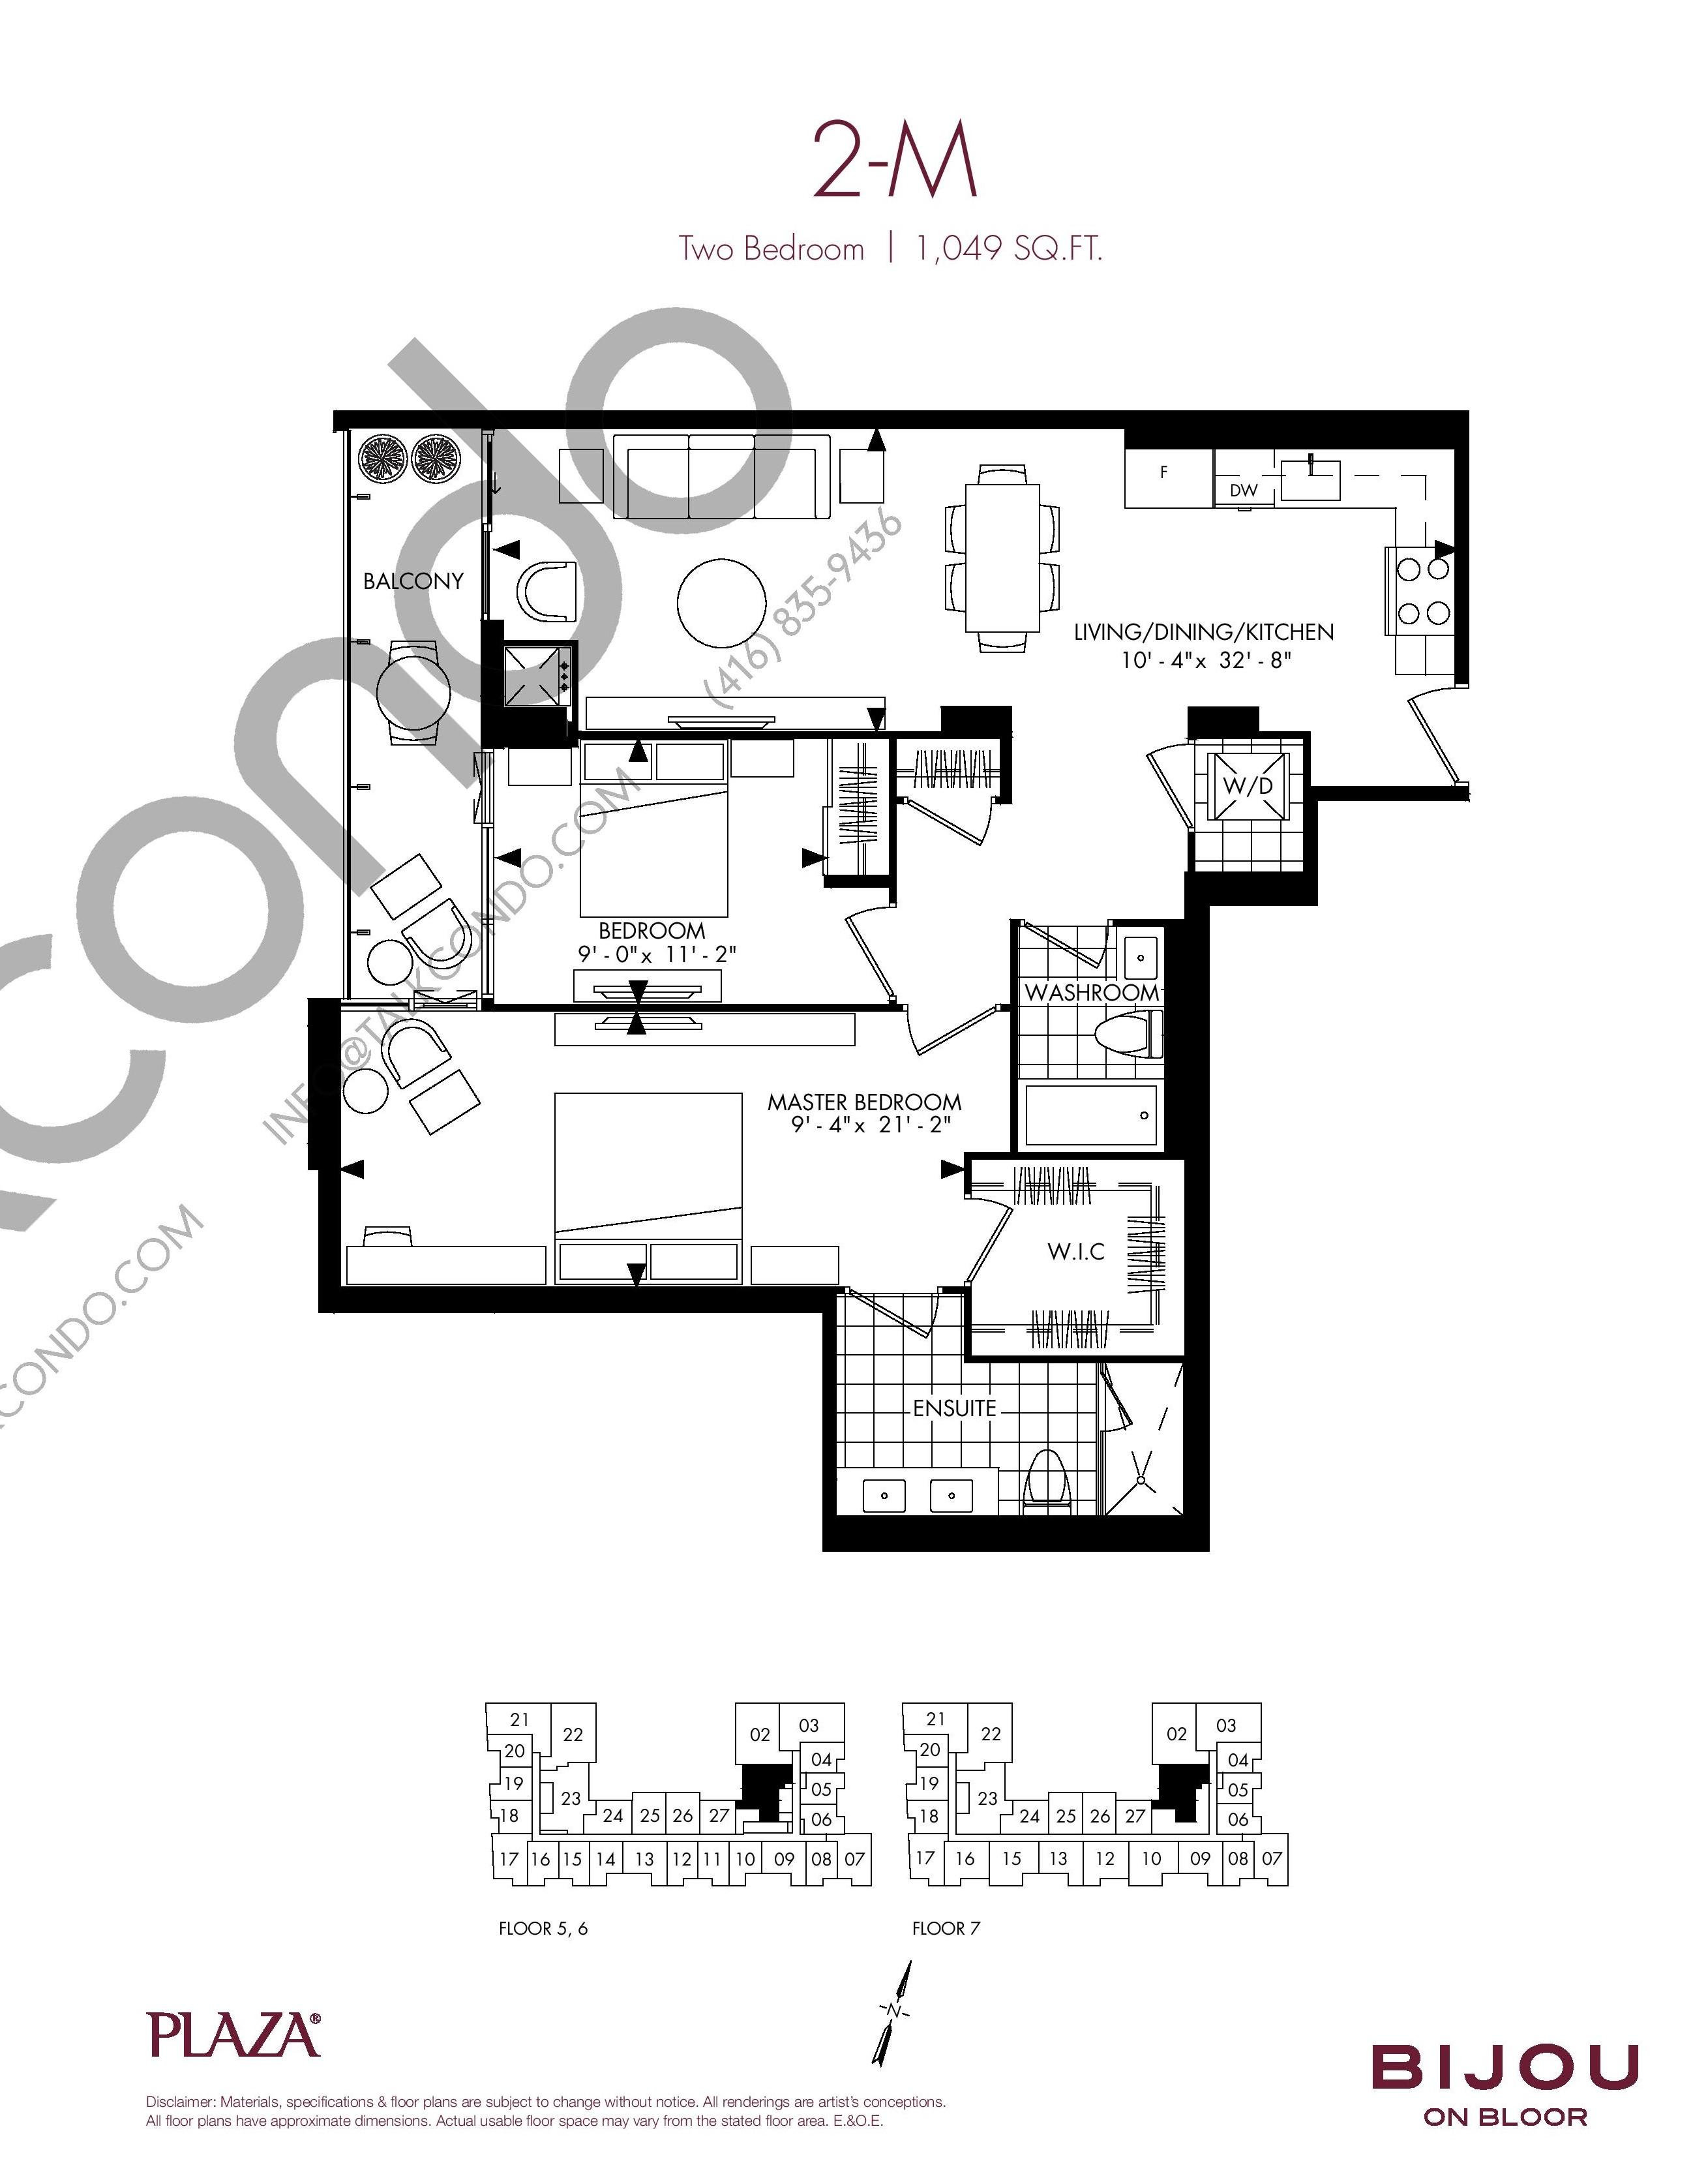 Suite 2-M Floor Plan at Bijou On Bloor Condos - 1049 sq.ft